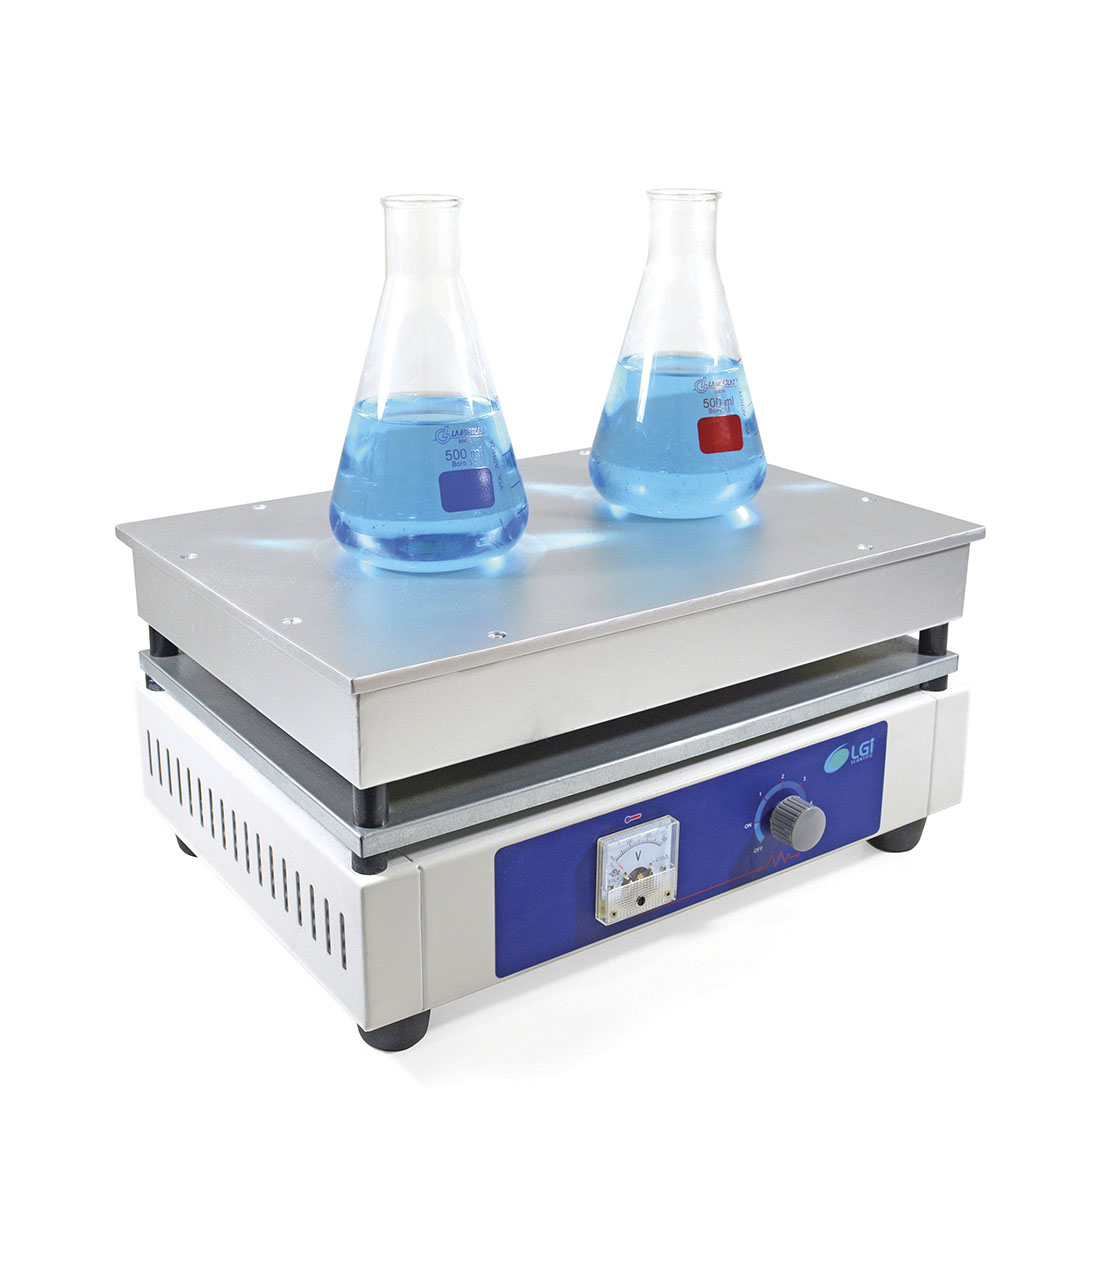 CHAPA AQUECEDORA ANALOGICA 40 X 28 CM - LGI SCIENTIFIC - Cód. LGI-HP-1.5